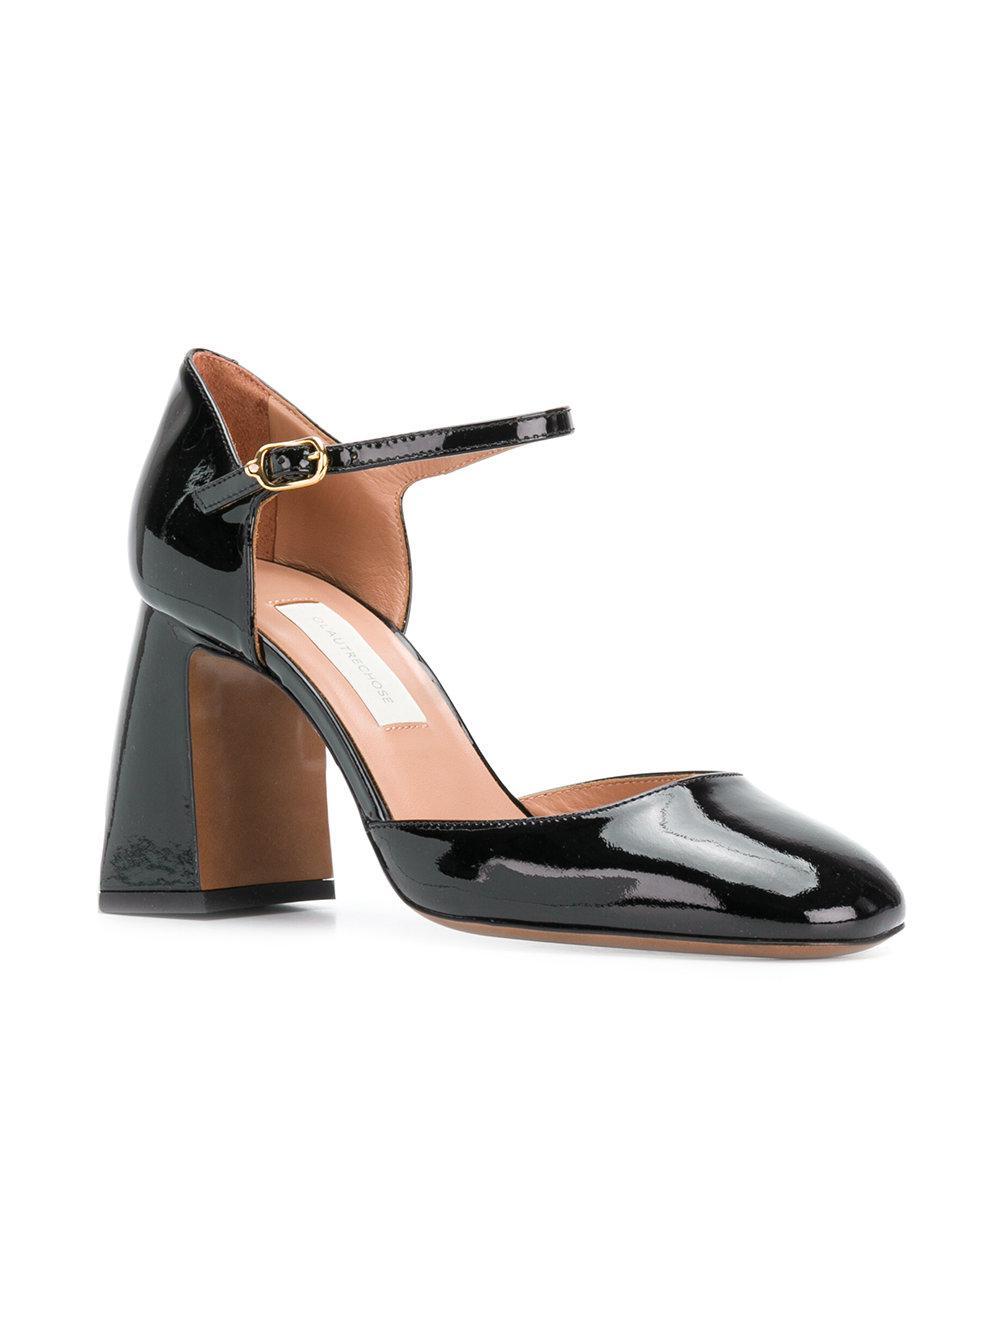 Free Shipping Browse Cheap Best Seller curved heel sandals - Black L'autre Chose Discount Amazon A8qU1pC